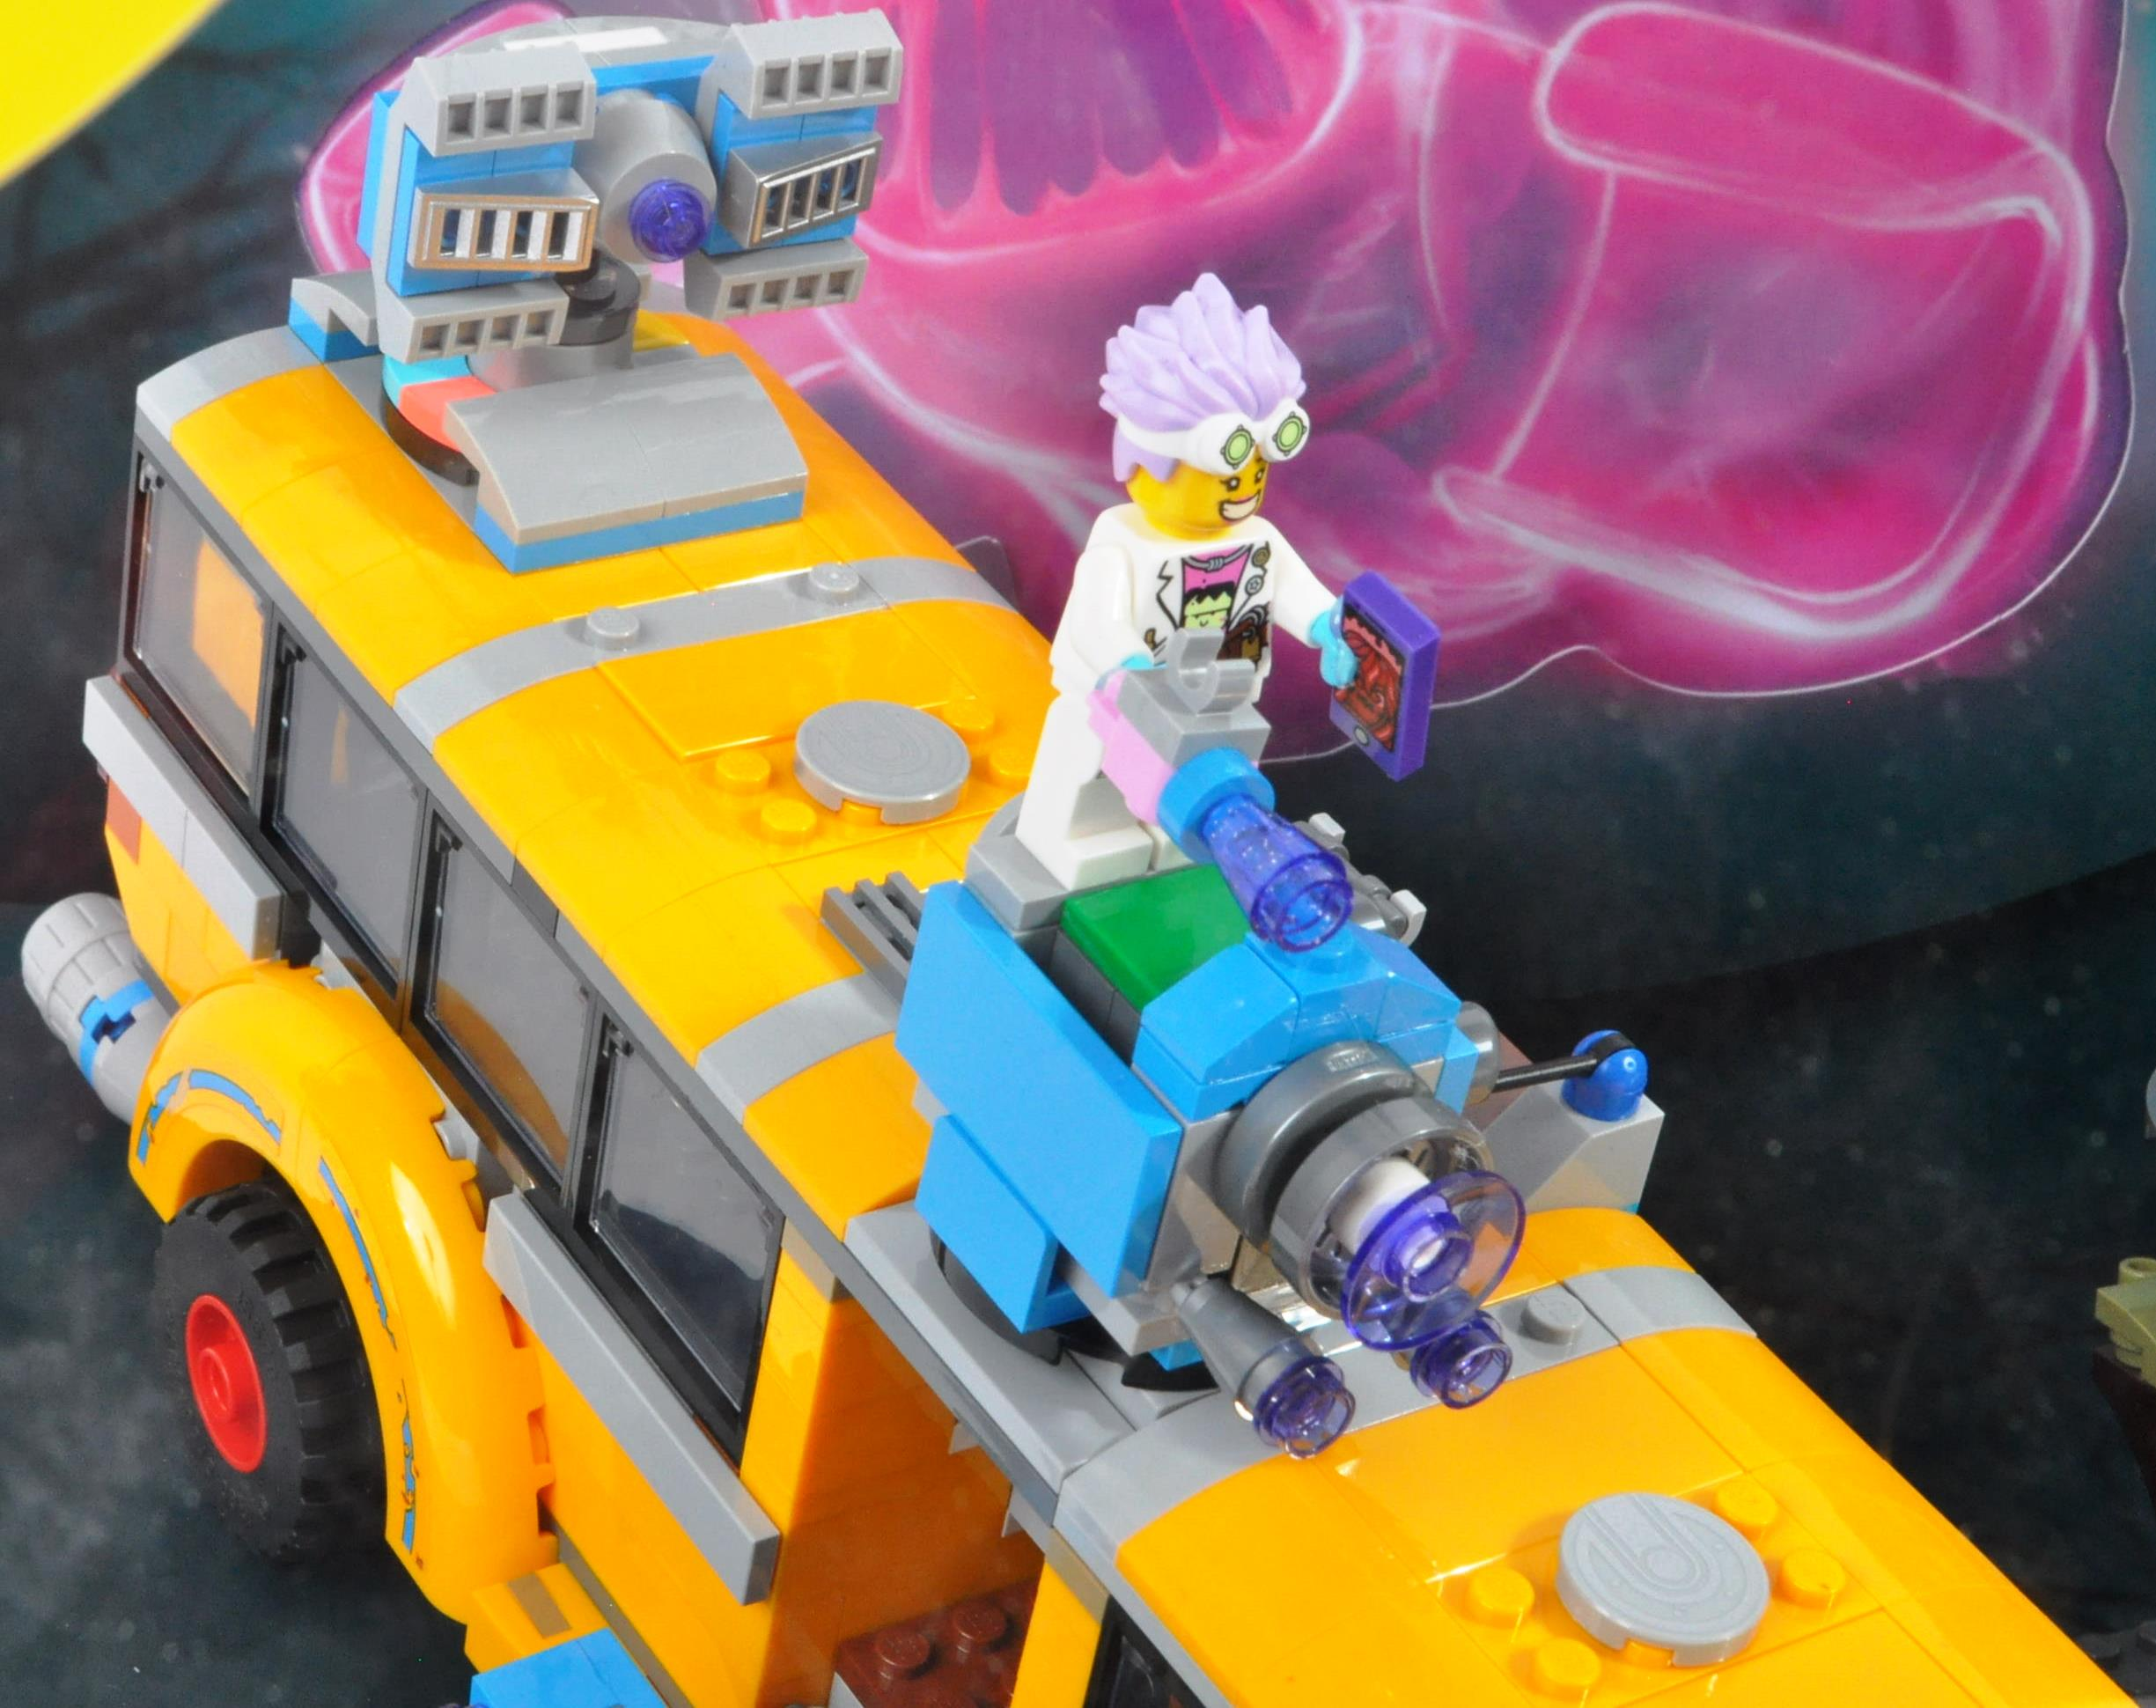 LEGO - HIDDEN SIDE - ORIGINAL IN STORE SHOP DISPLAY CABINET - Image 6 of 8